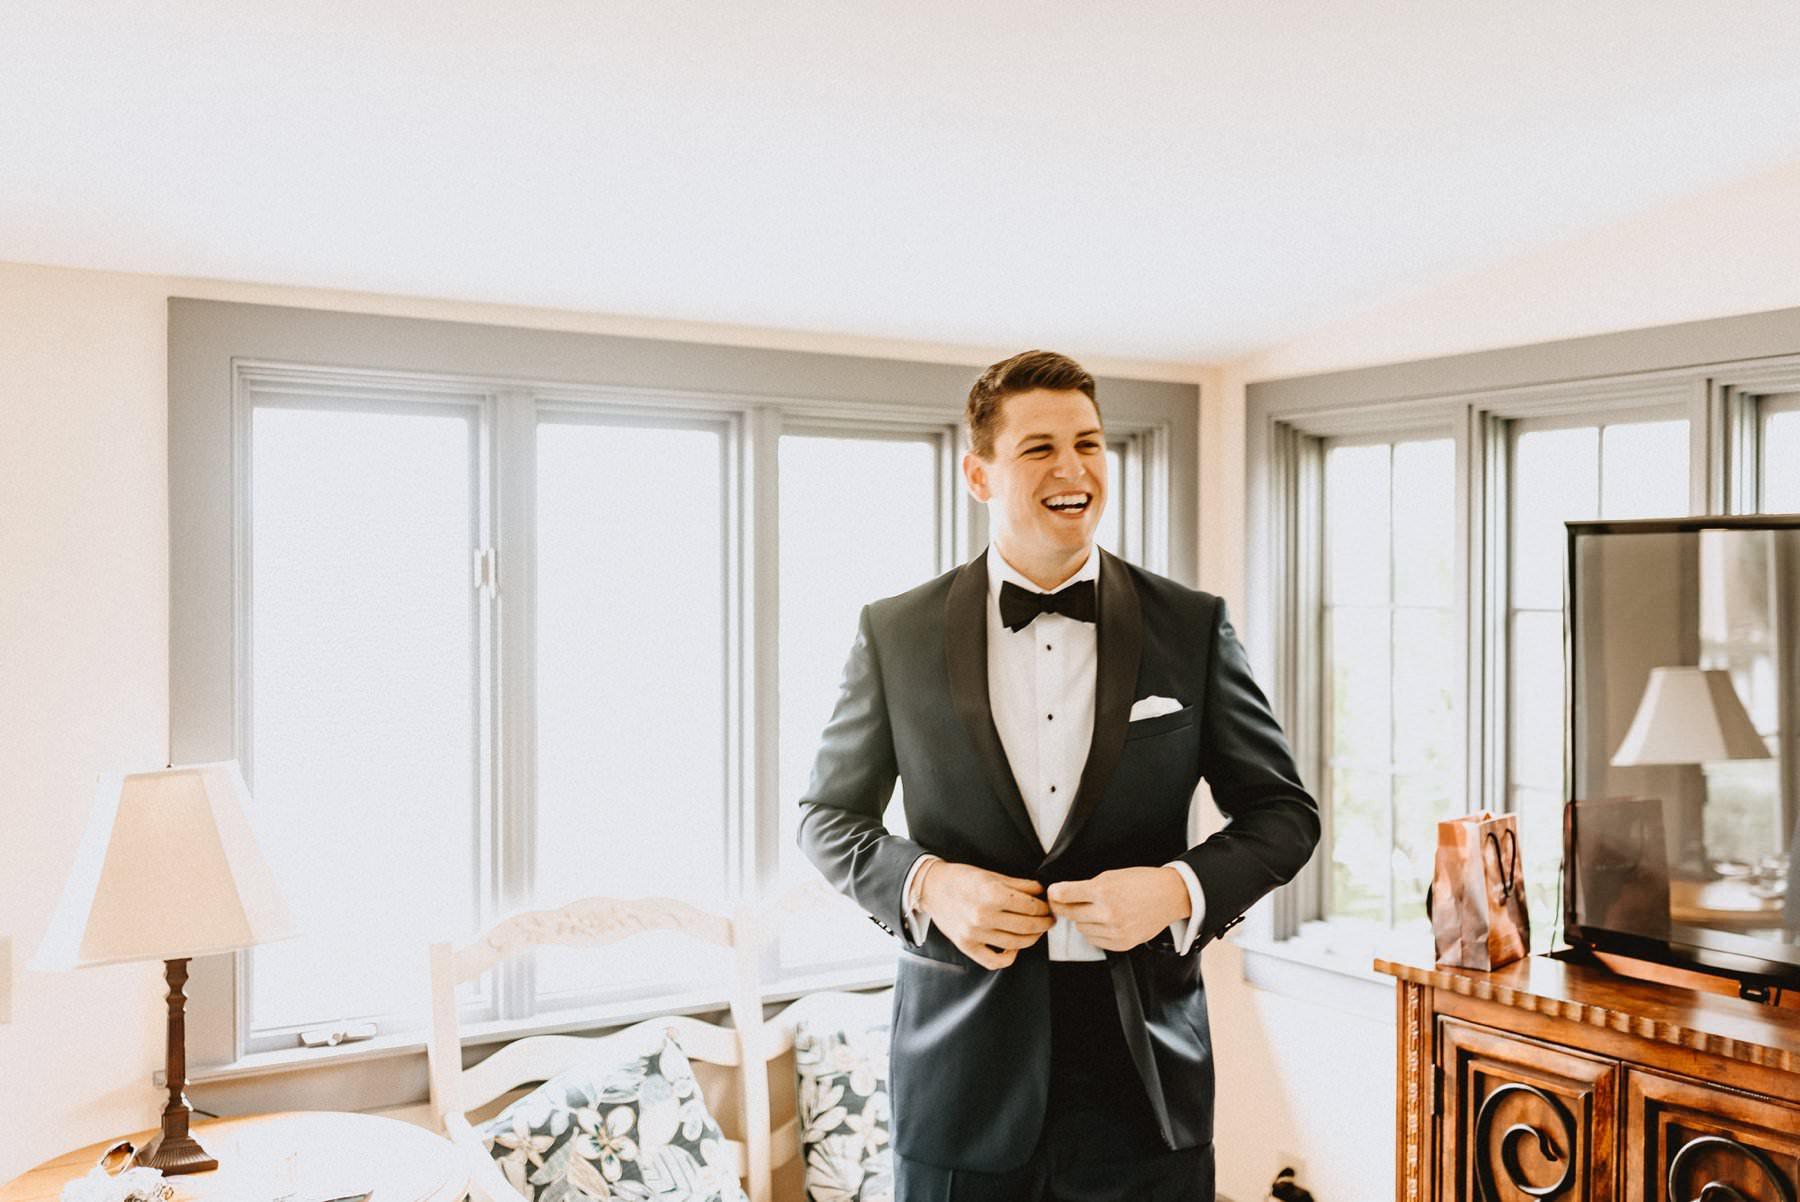 Philadelphia_private_estate_wedding-026.jpg